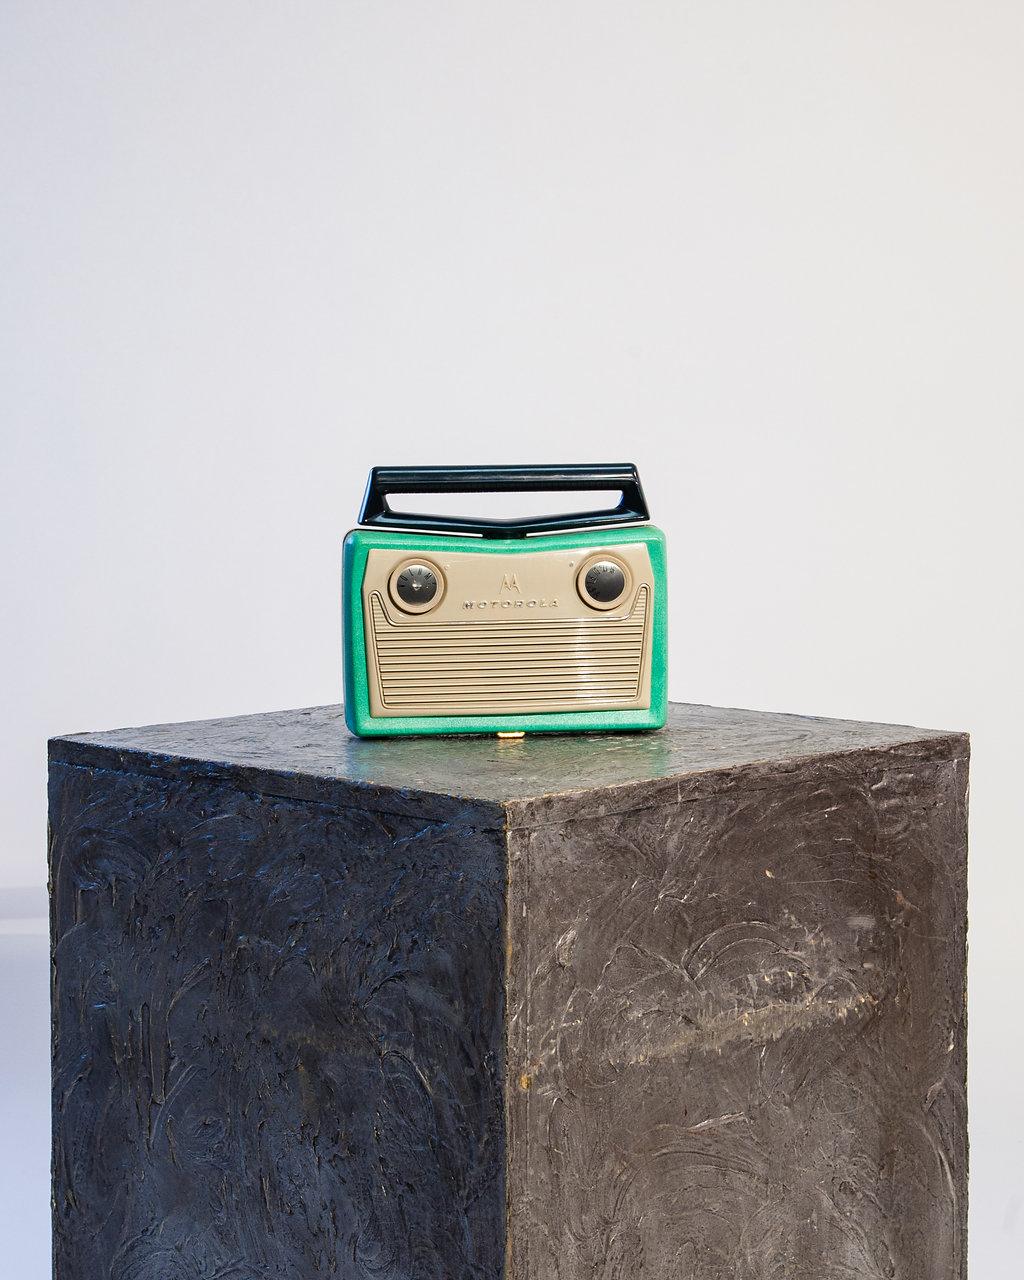 1960s Motorola Radio